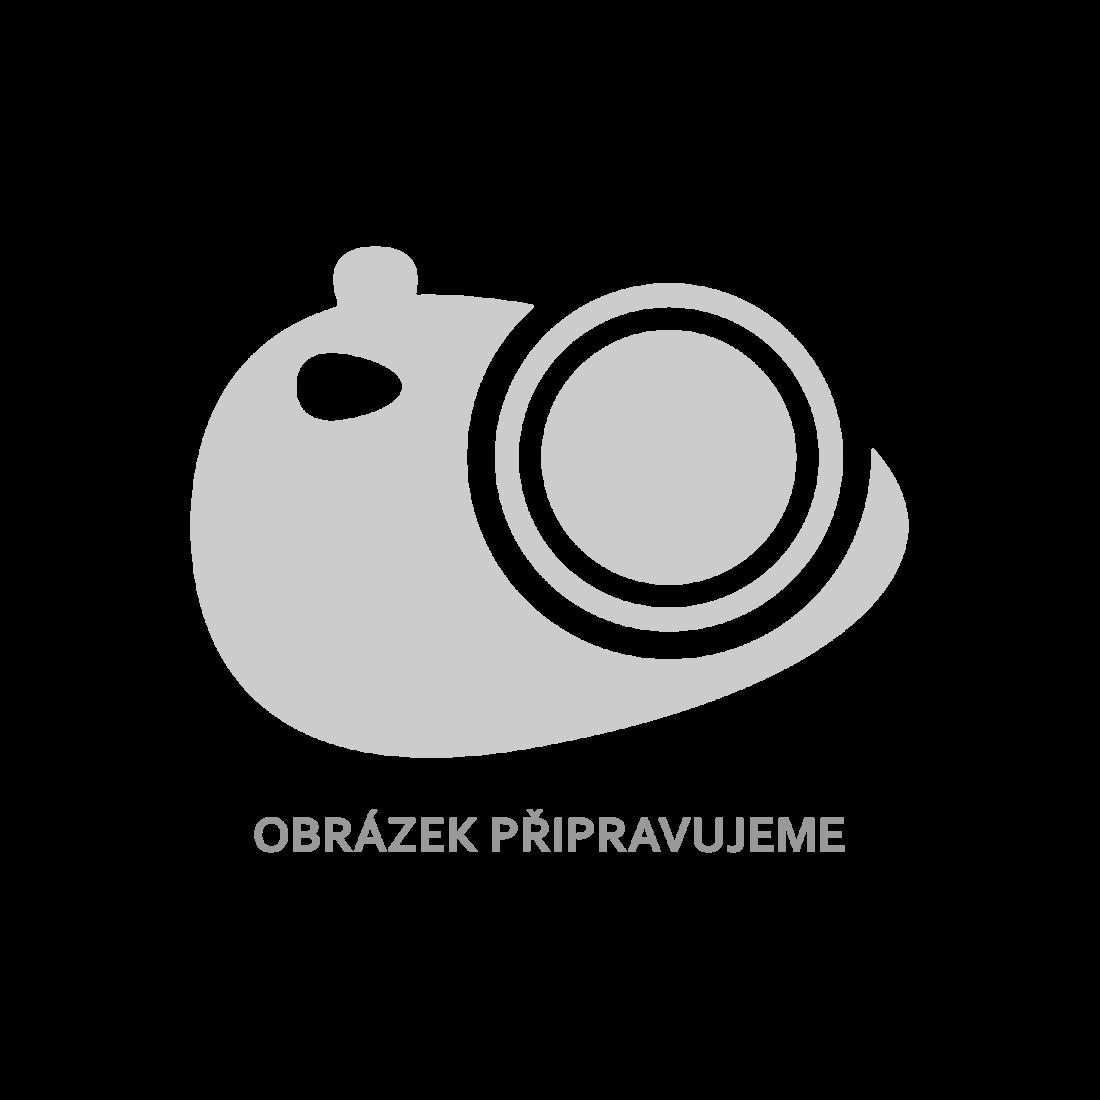 vidaXL Knihovna bílá 97,5 x 29,5 x 100 cm dřevotříska [800171]